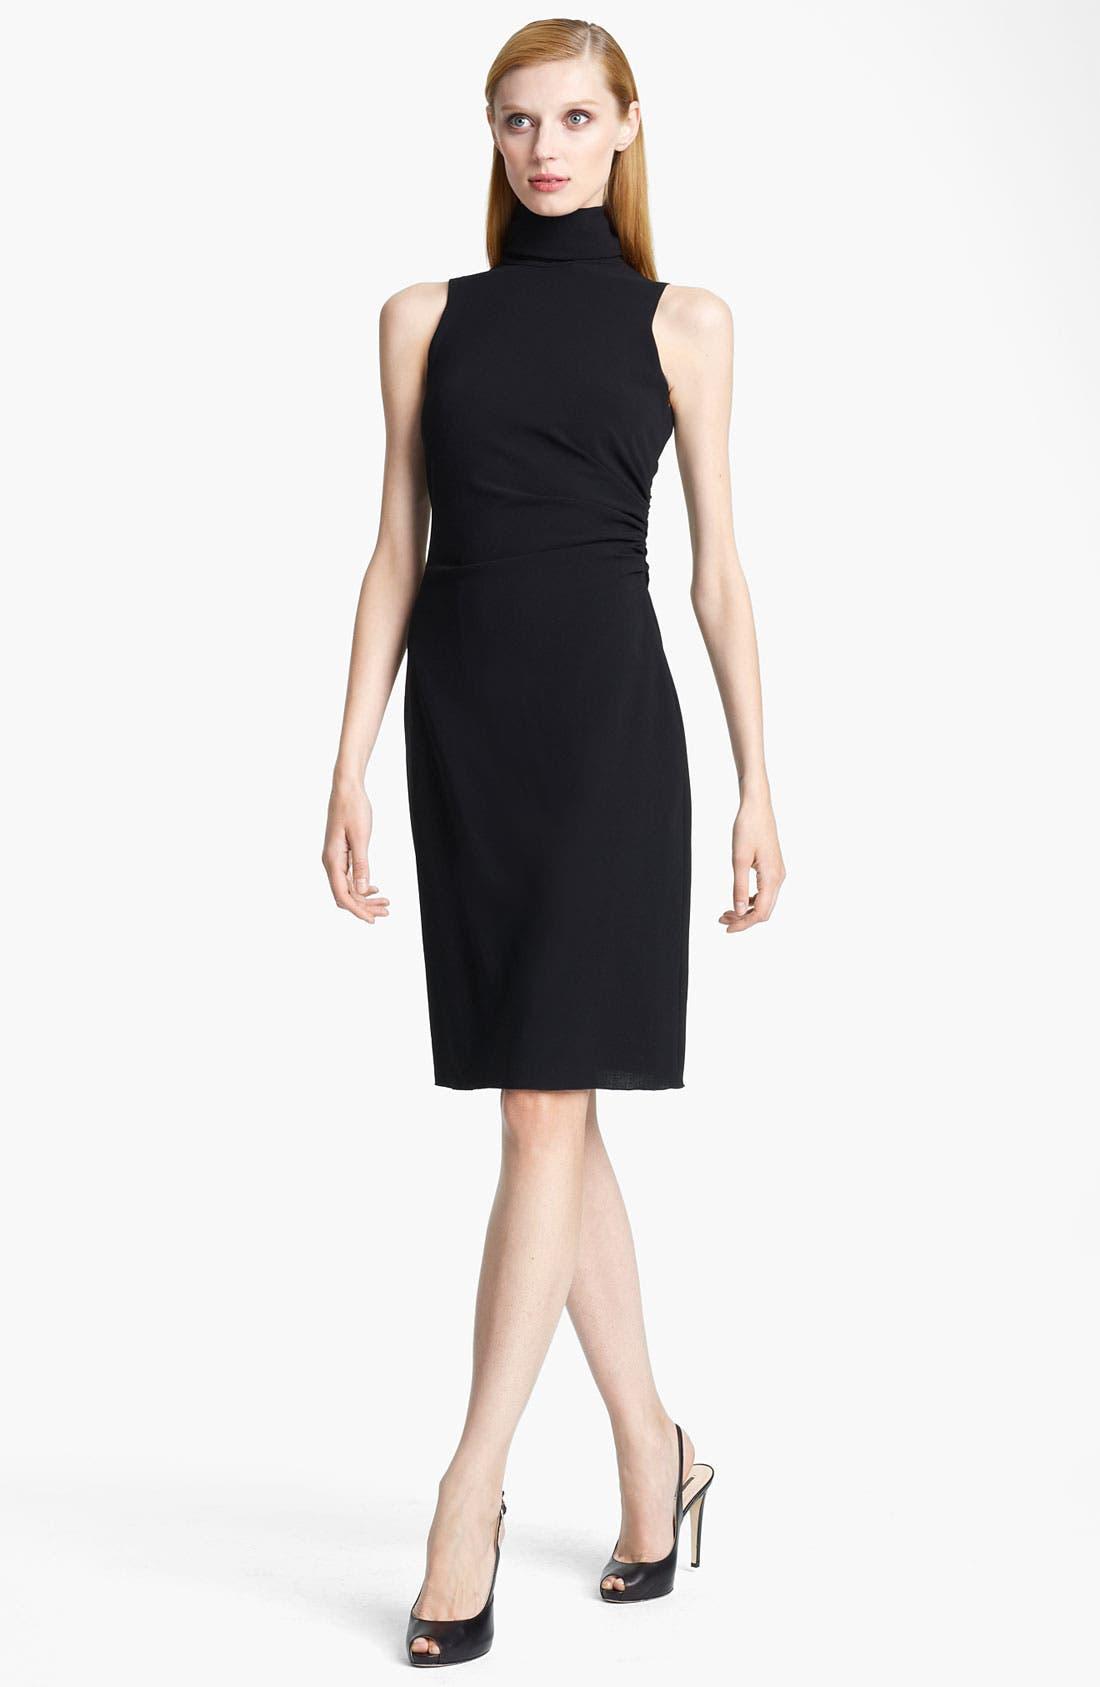 Alternate Image 1 Selected - Armani Collezioni Mock Neck Crepe Dress